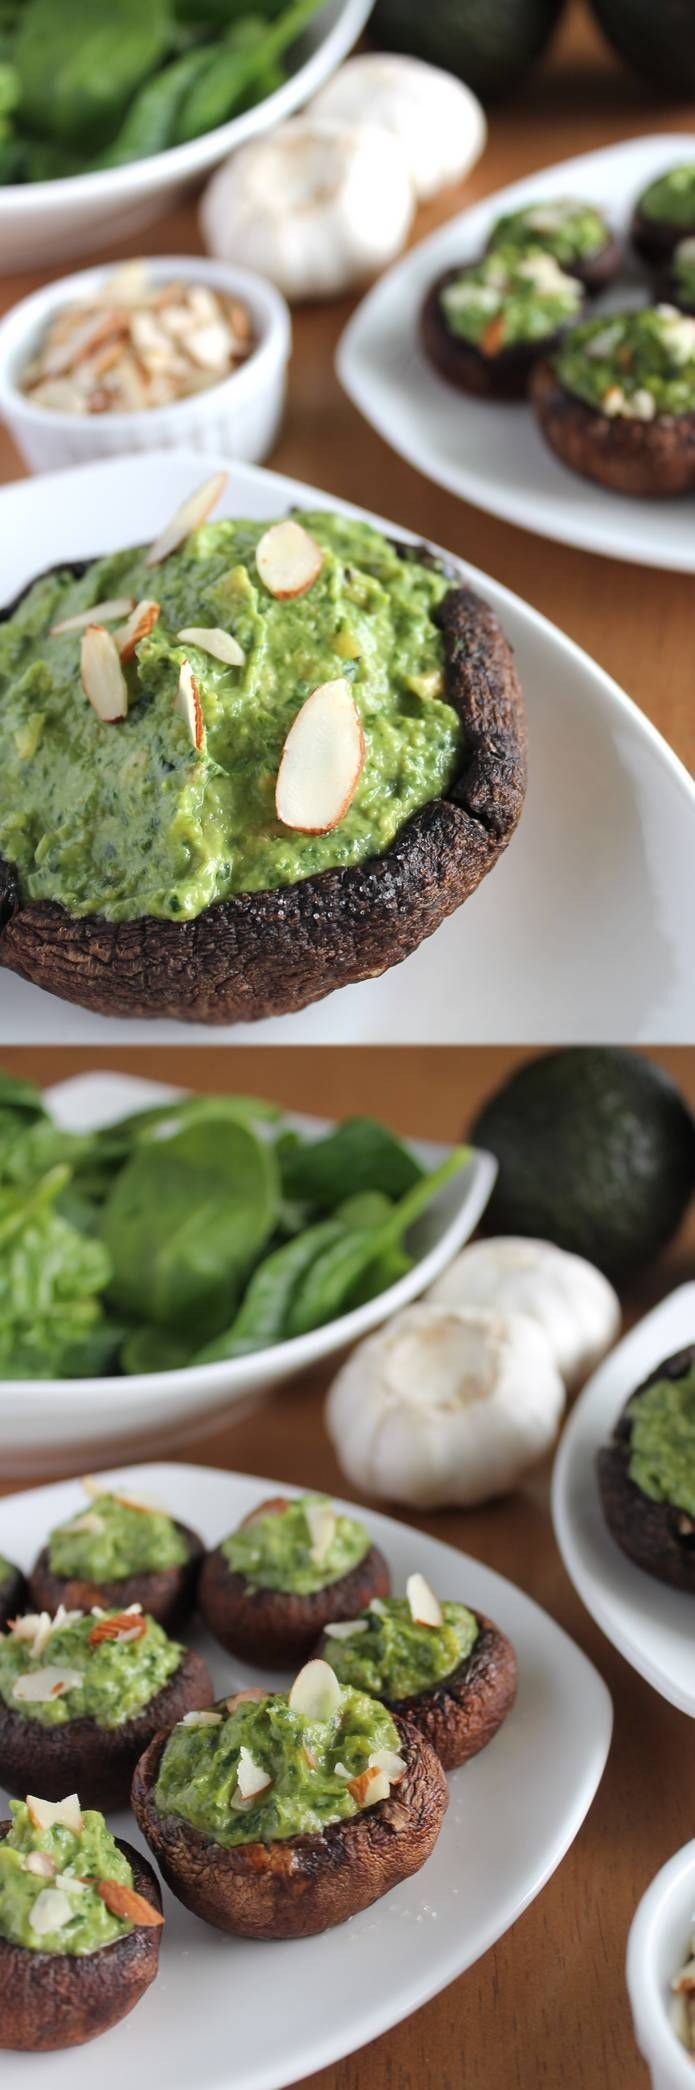 Spinach Avocado stuffed Portobellos--vegan, gluten-free, soy-free, and stress-free